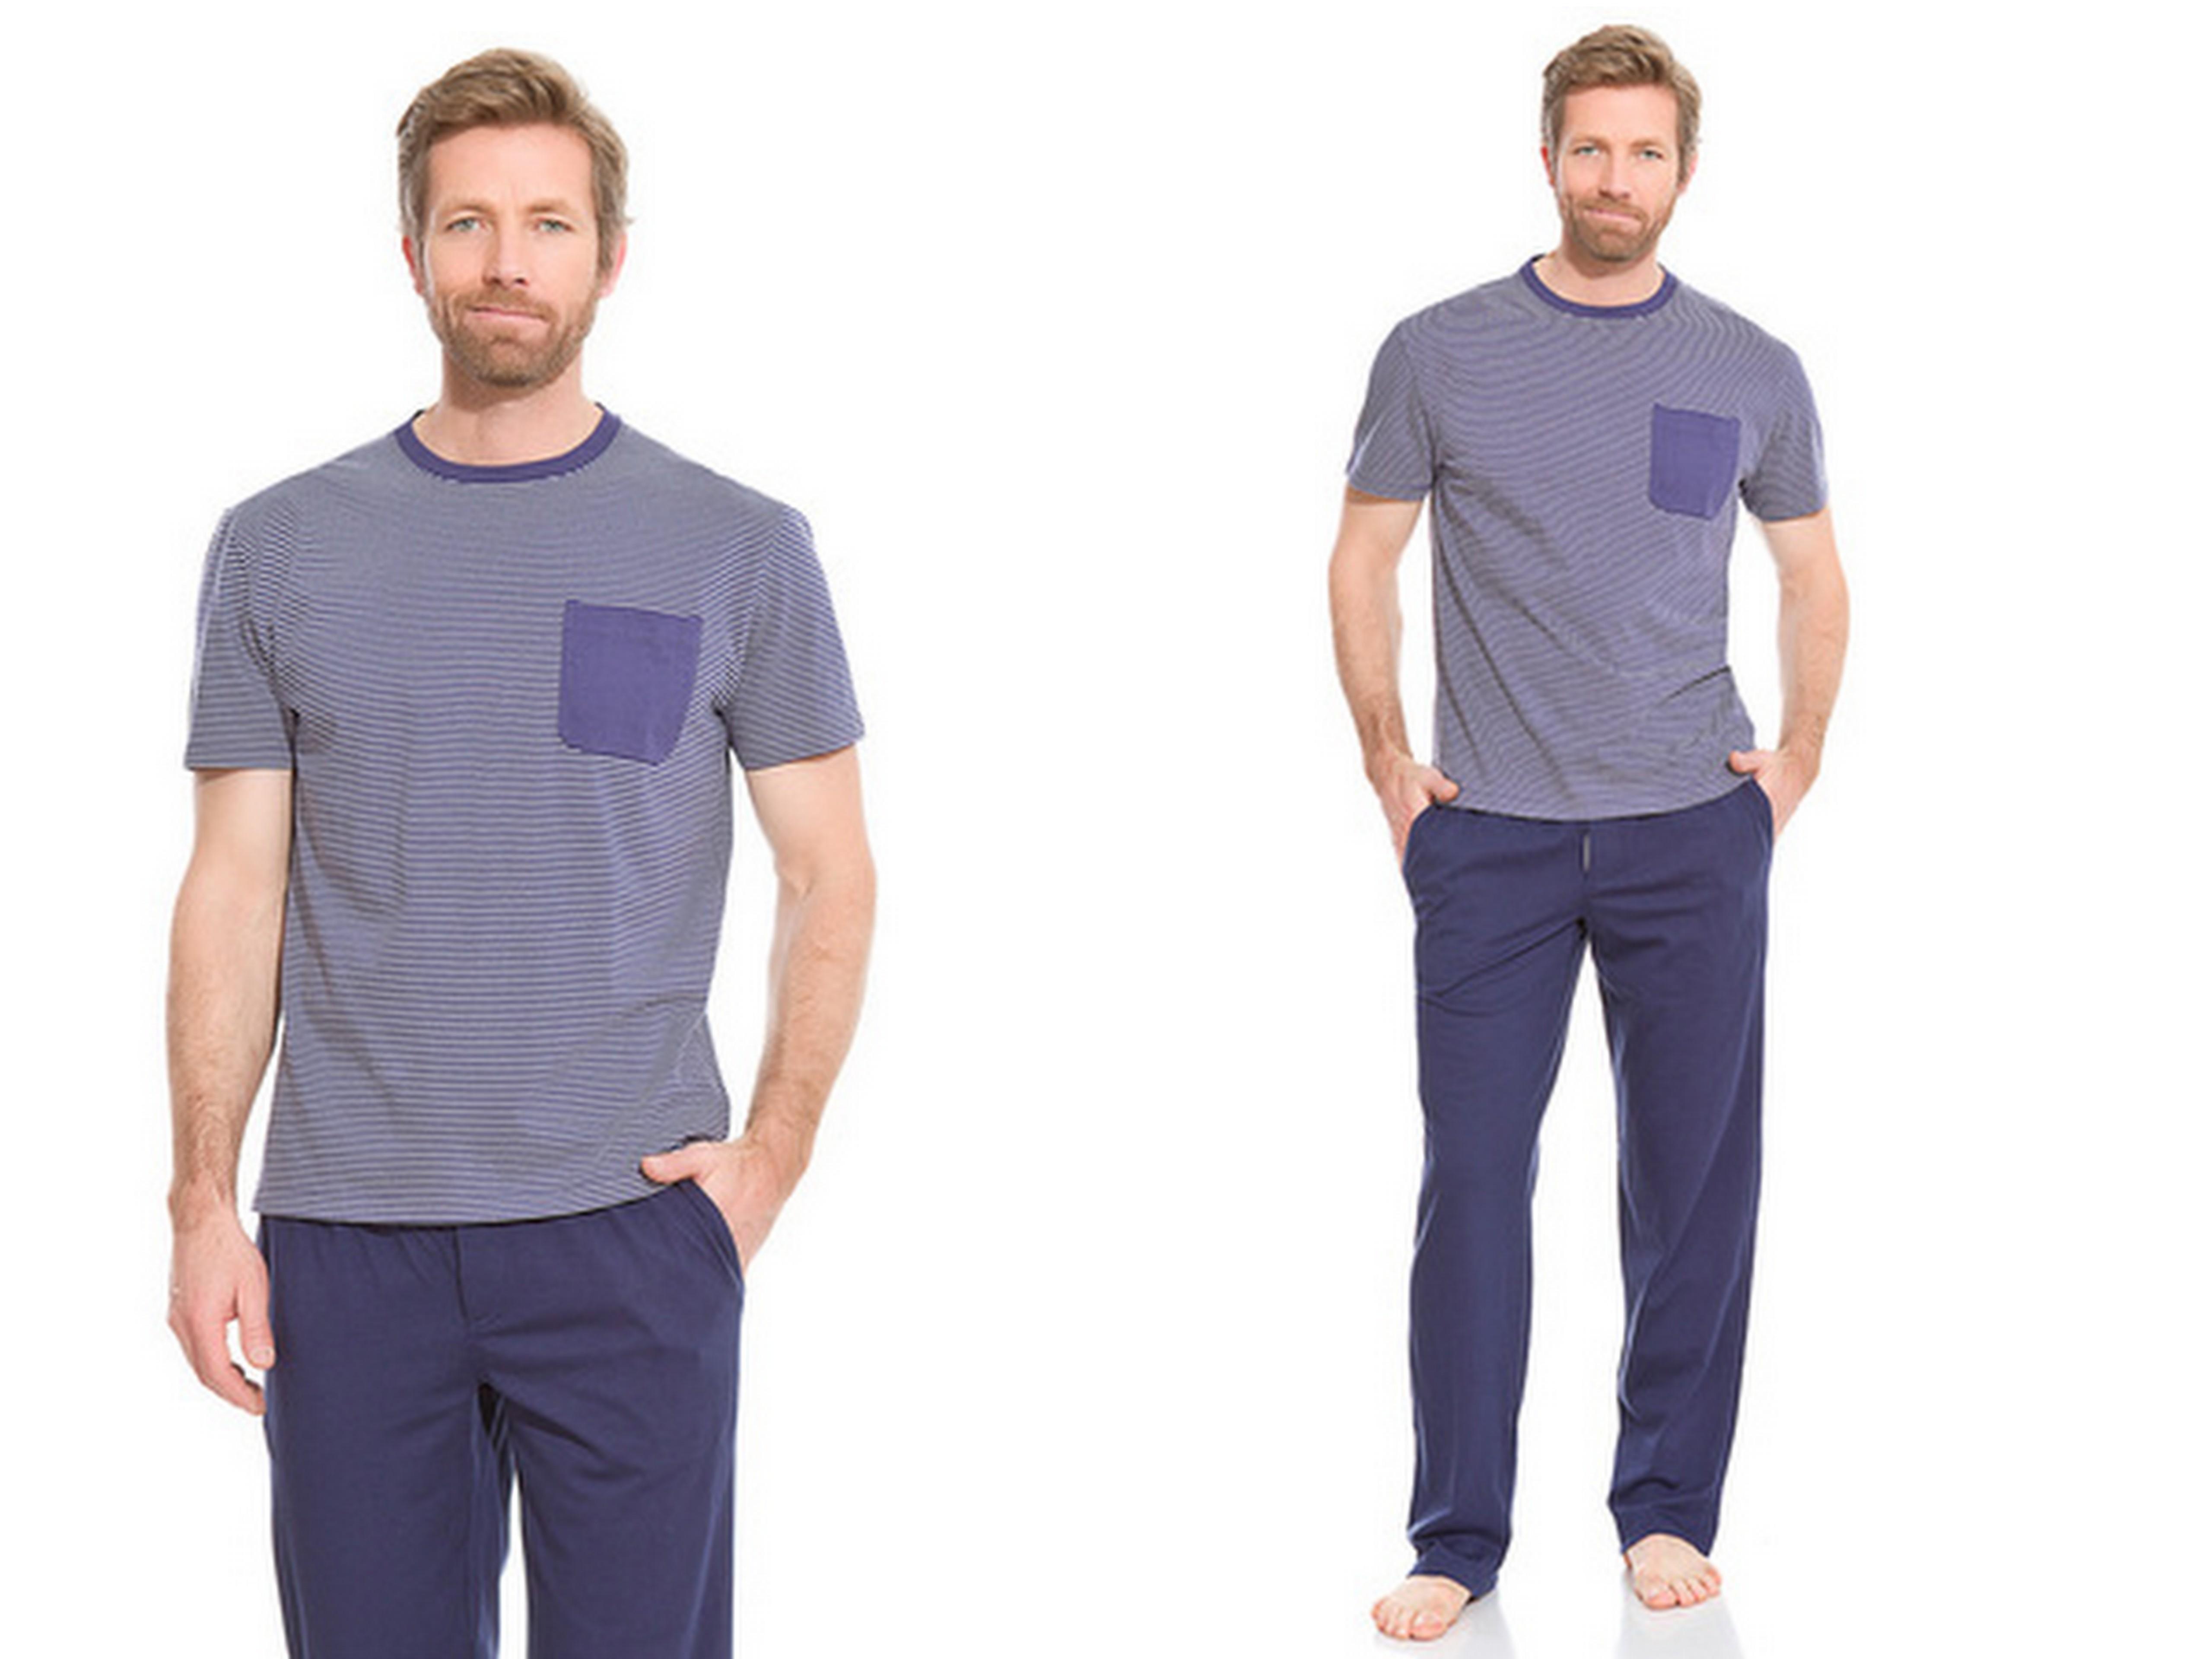 pijamashombre